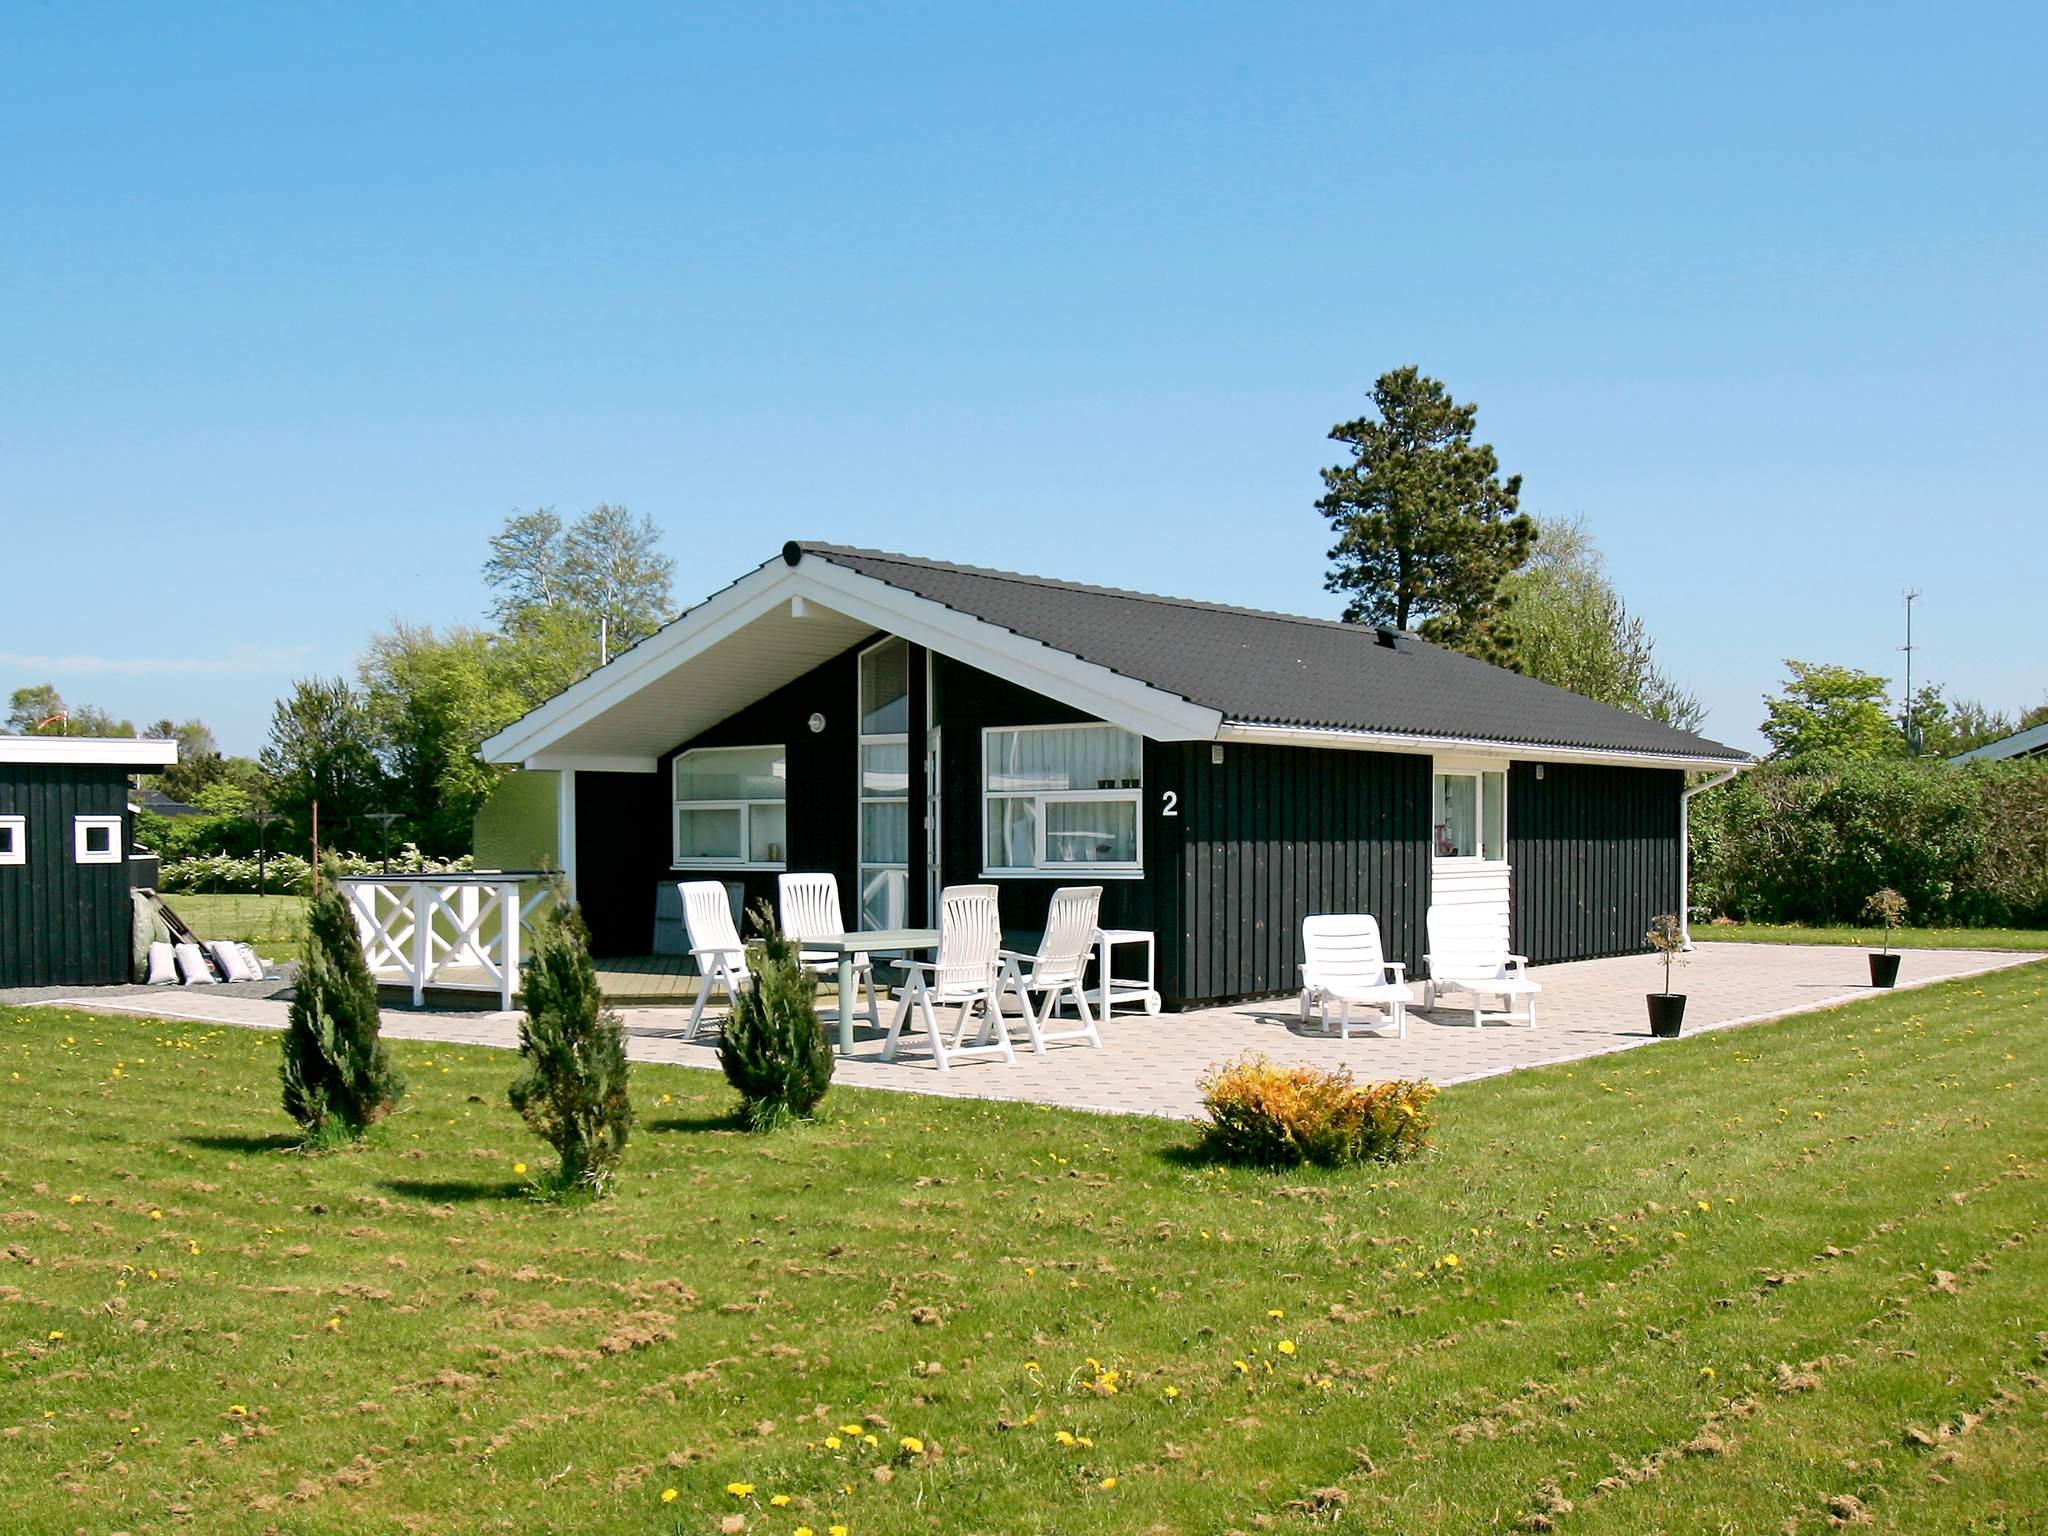 Ferienhaus Øster Hurup (480896), Øster Hurup, , Ostjütland, Dänemark, Bild 9